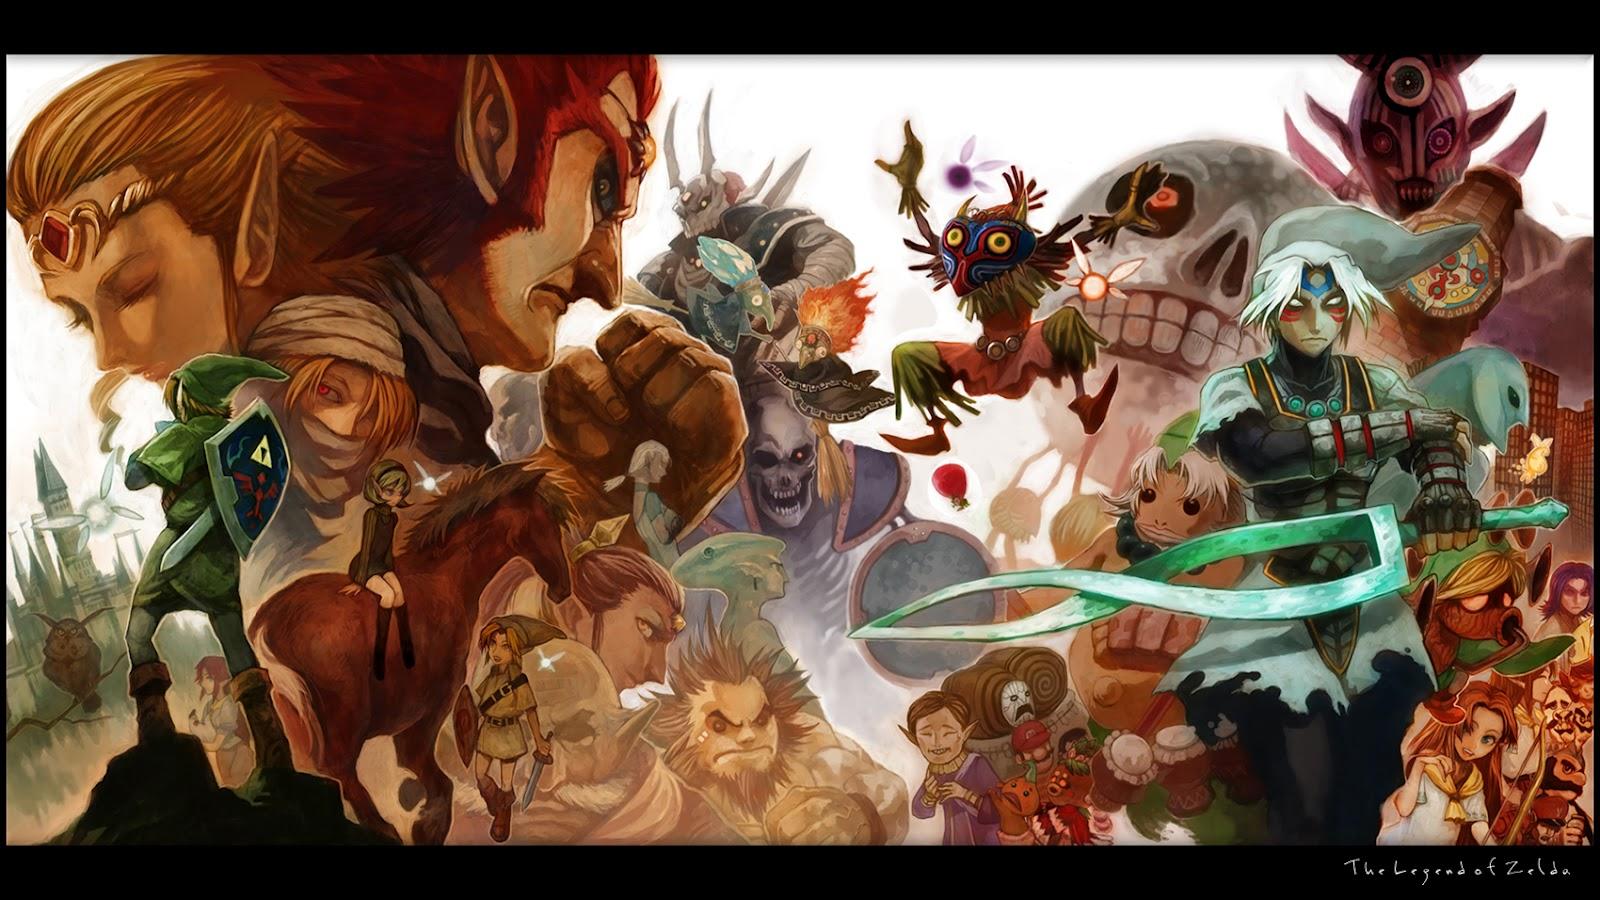 Video Game Gallery The Legend Of Zelda Majoras Mask Wallpaper